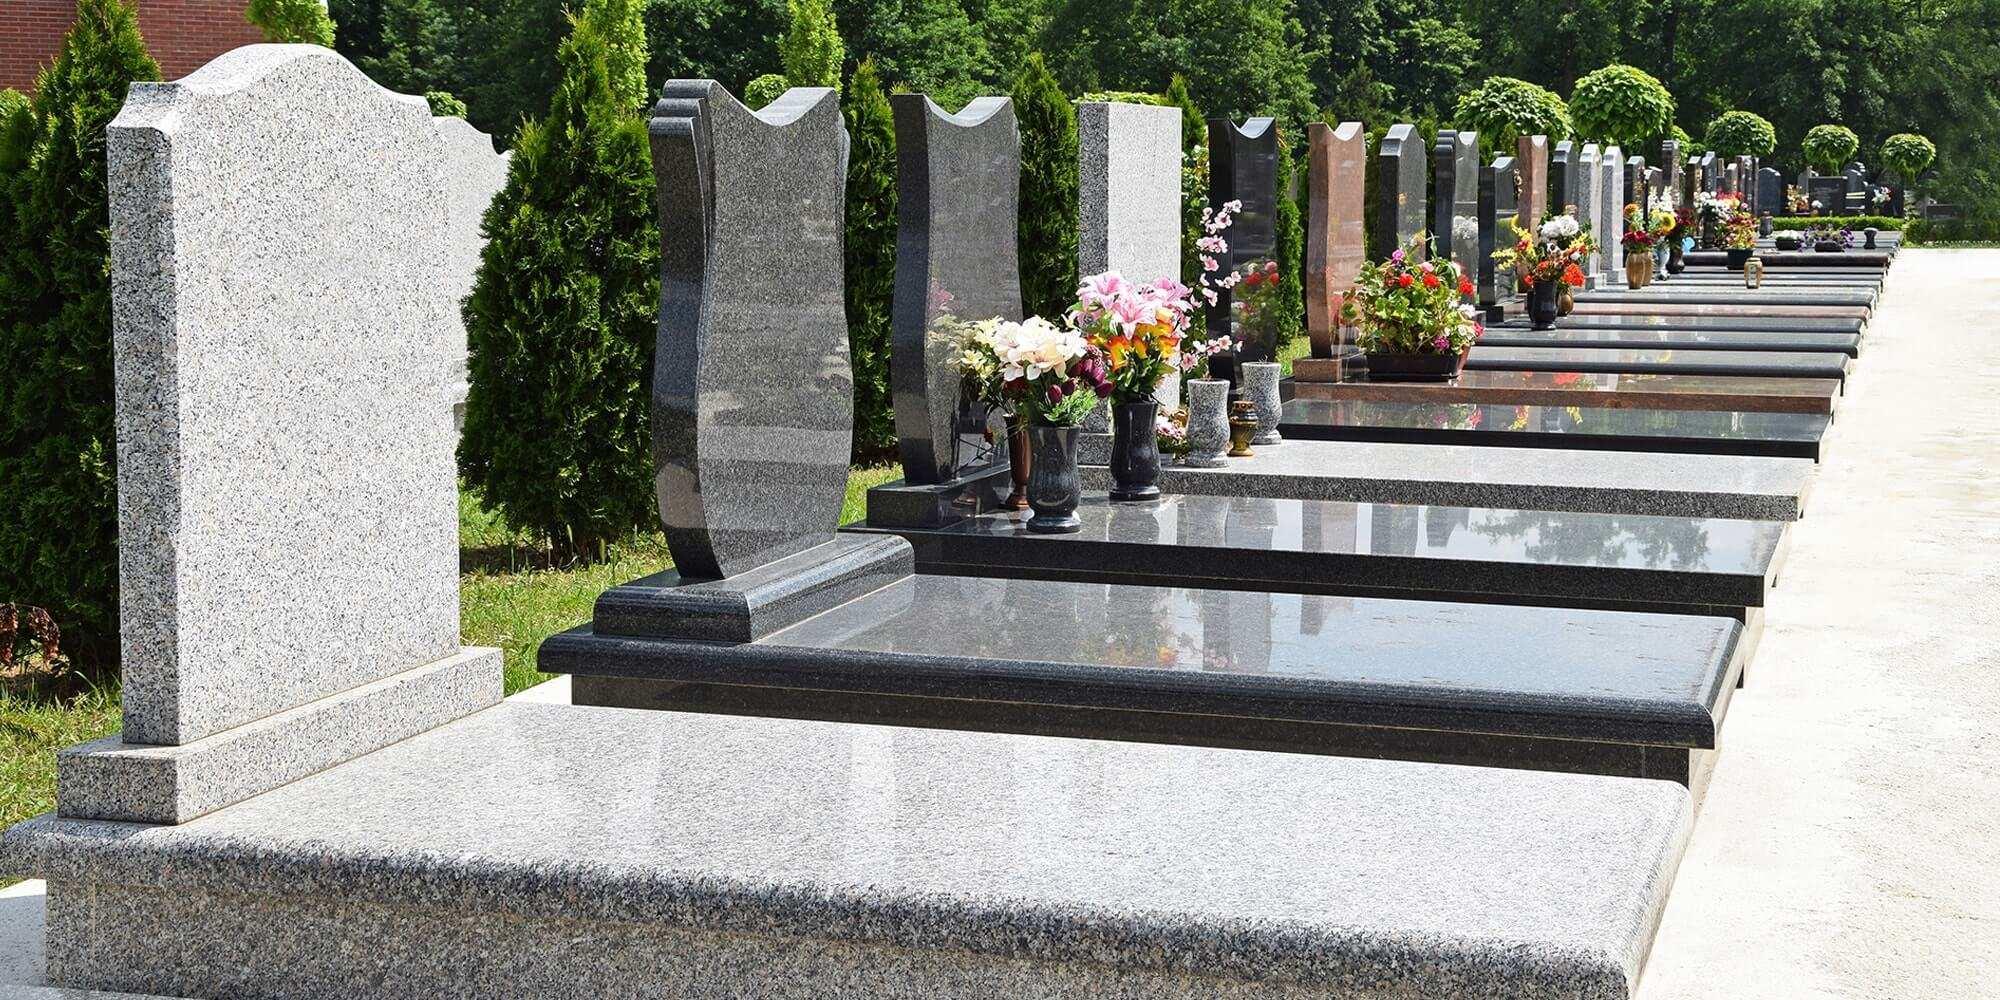 Granitmuster Granitt Grabmale Heidebrecht Grabsteine Denkmaler Grabschmuck Einzelgraber Doppelgraber Granitt Grabmale Heidebrecht